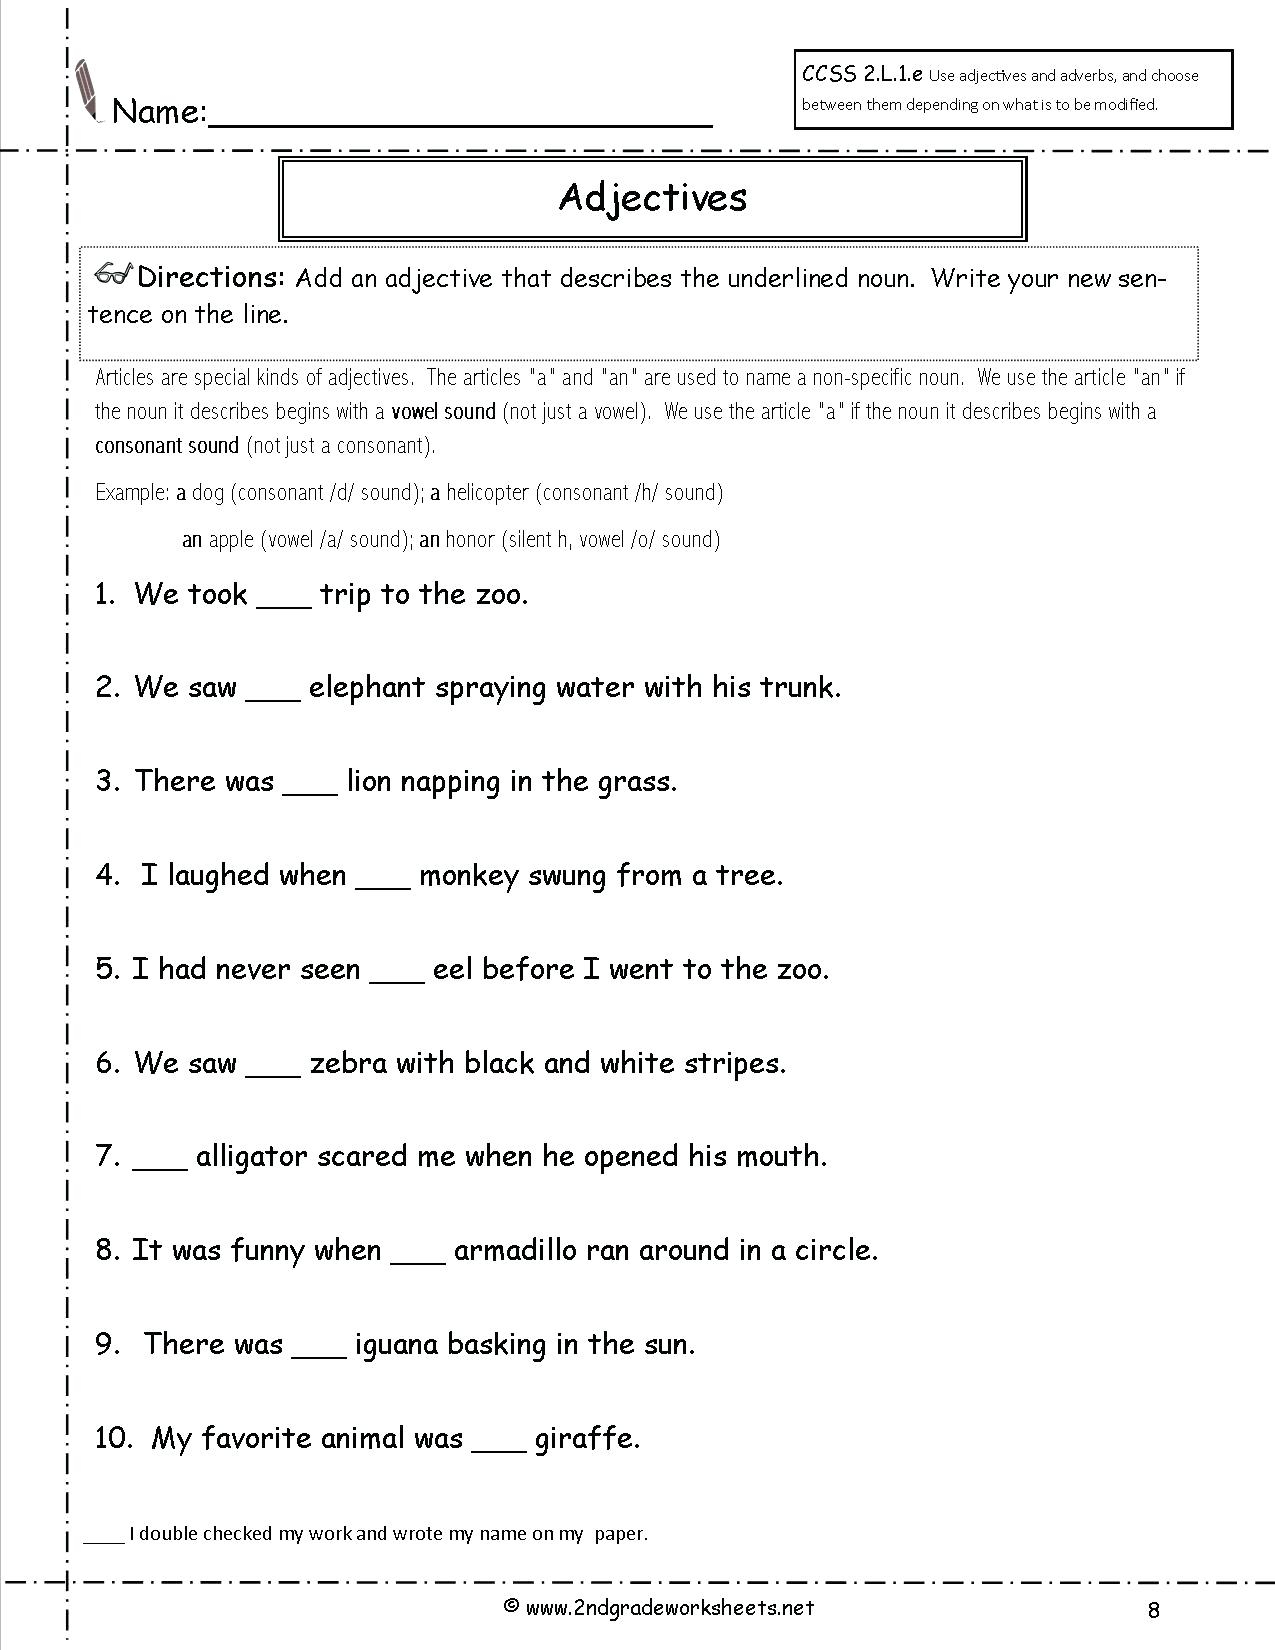 Free Printable Fifth Grade Science Worksheets